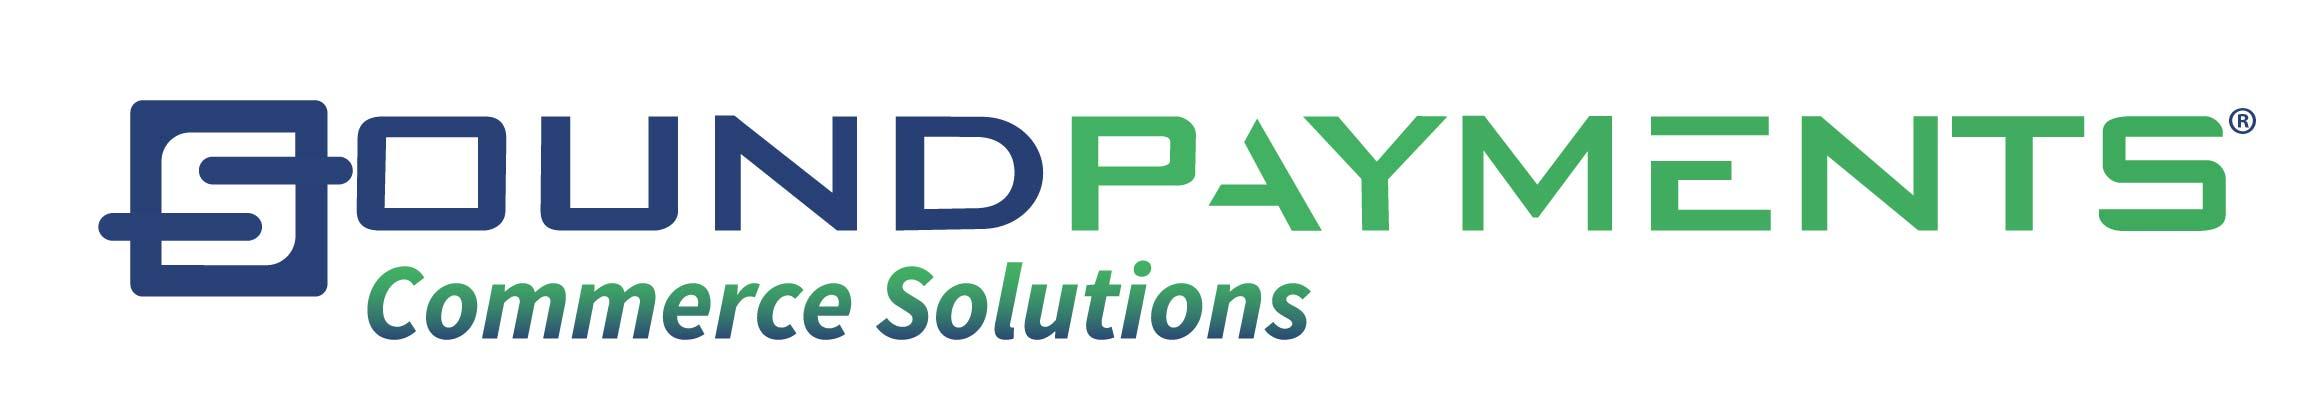 Sound Payments Commerce Solutions - Electronic Cash Registers, ISV, Cloud Solutions